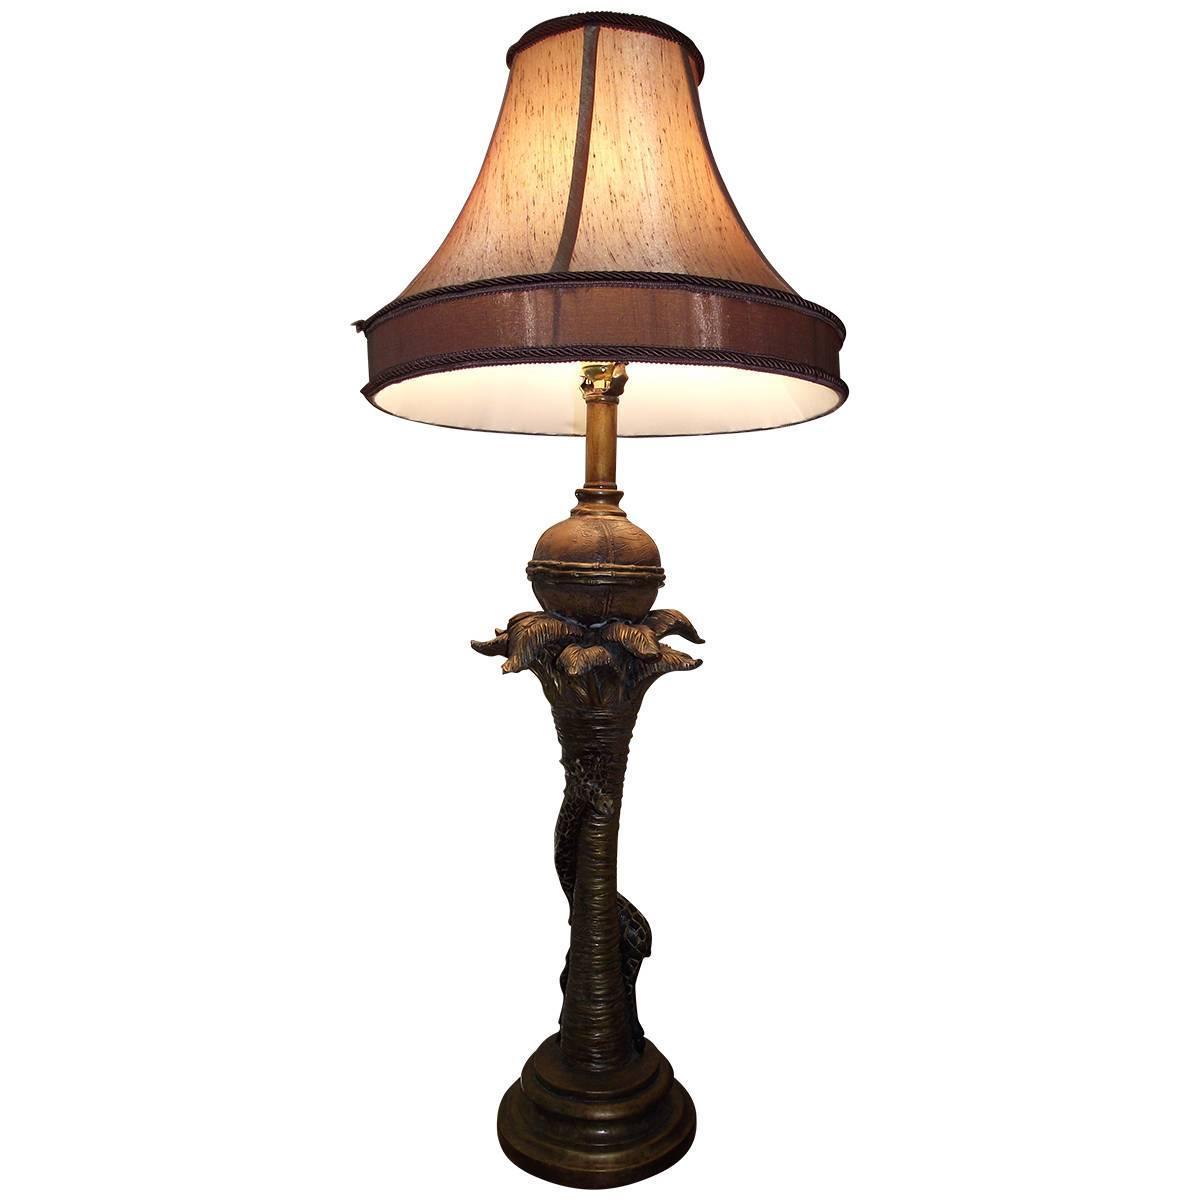 giraffe table or buffet lamp unusual lamp in brown and